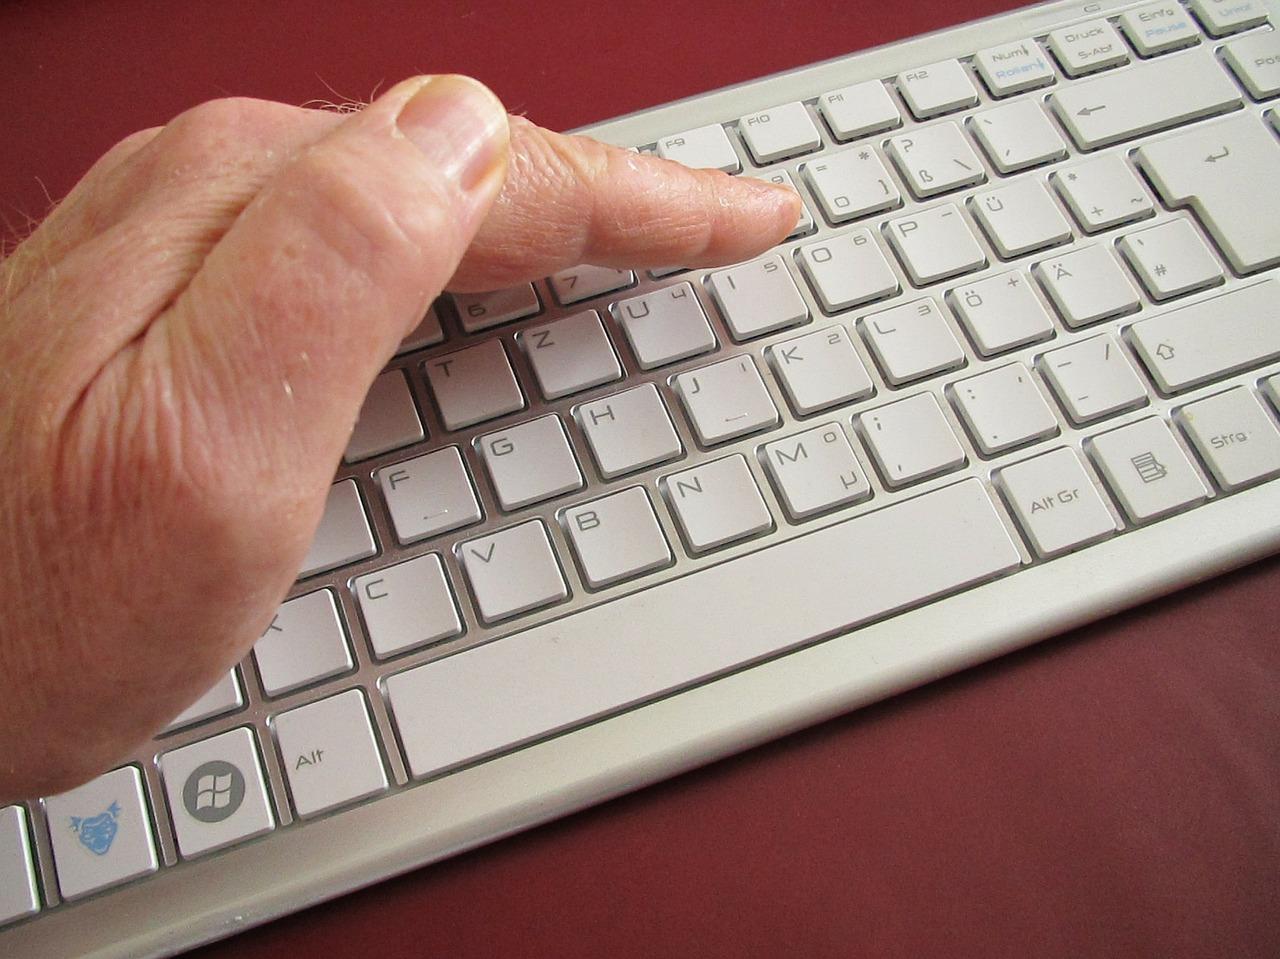 keyboard-142332_1280